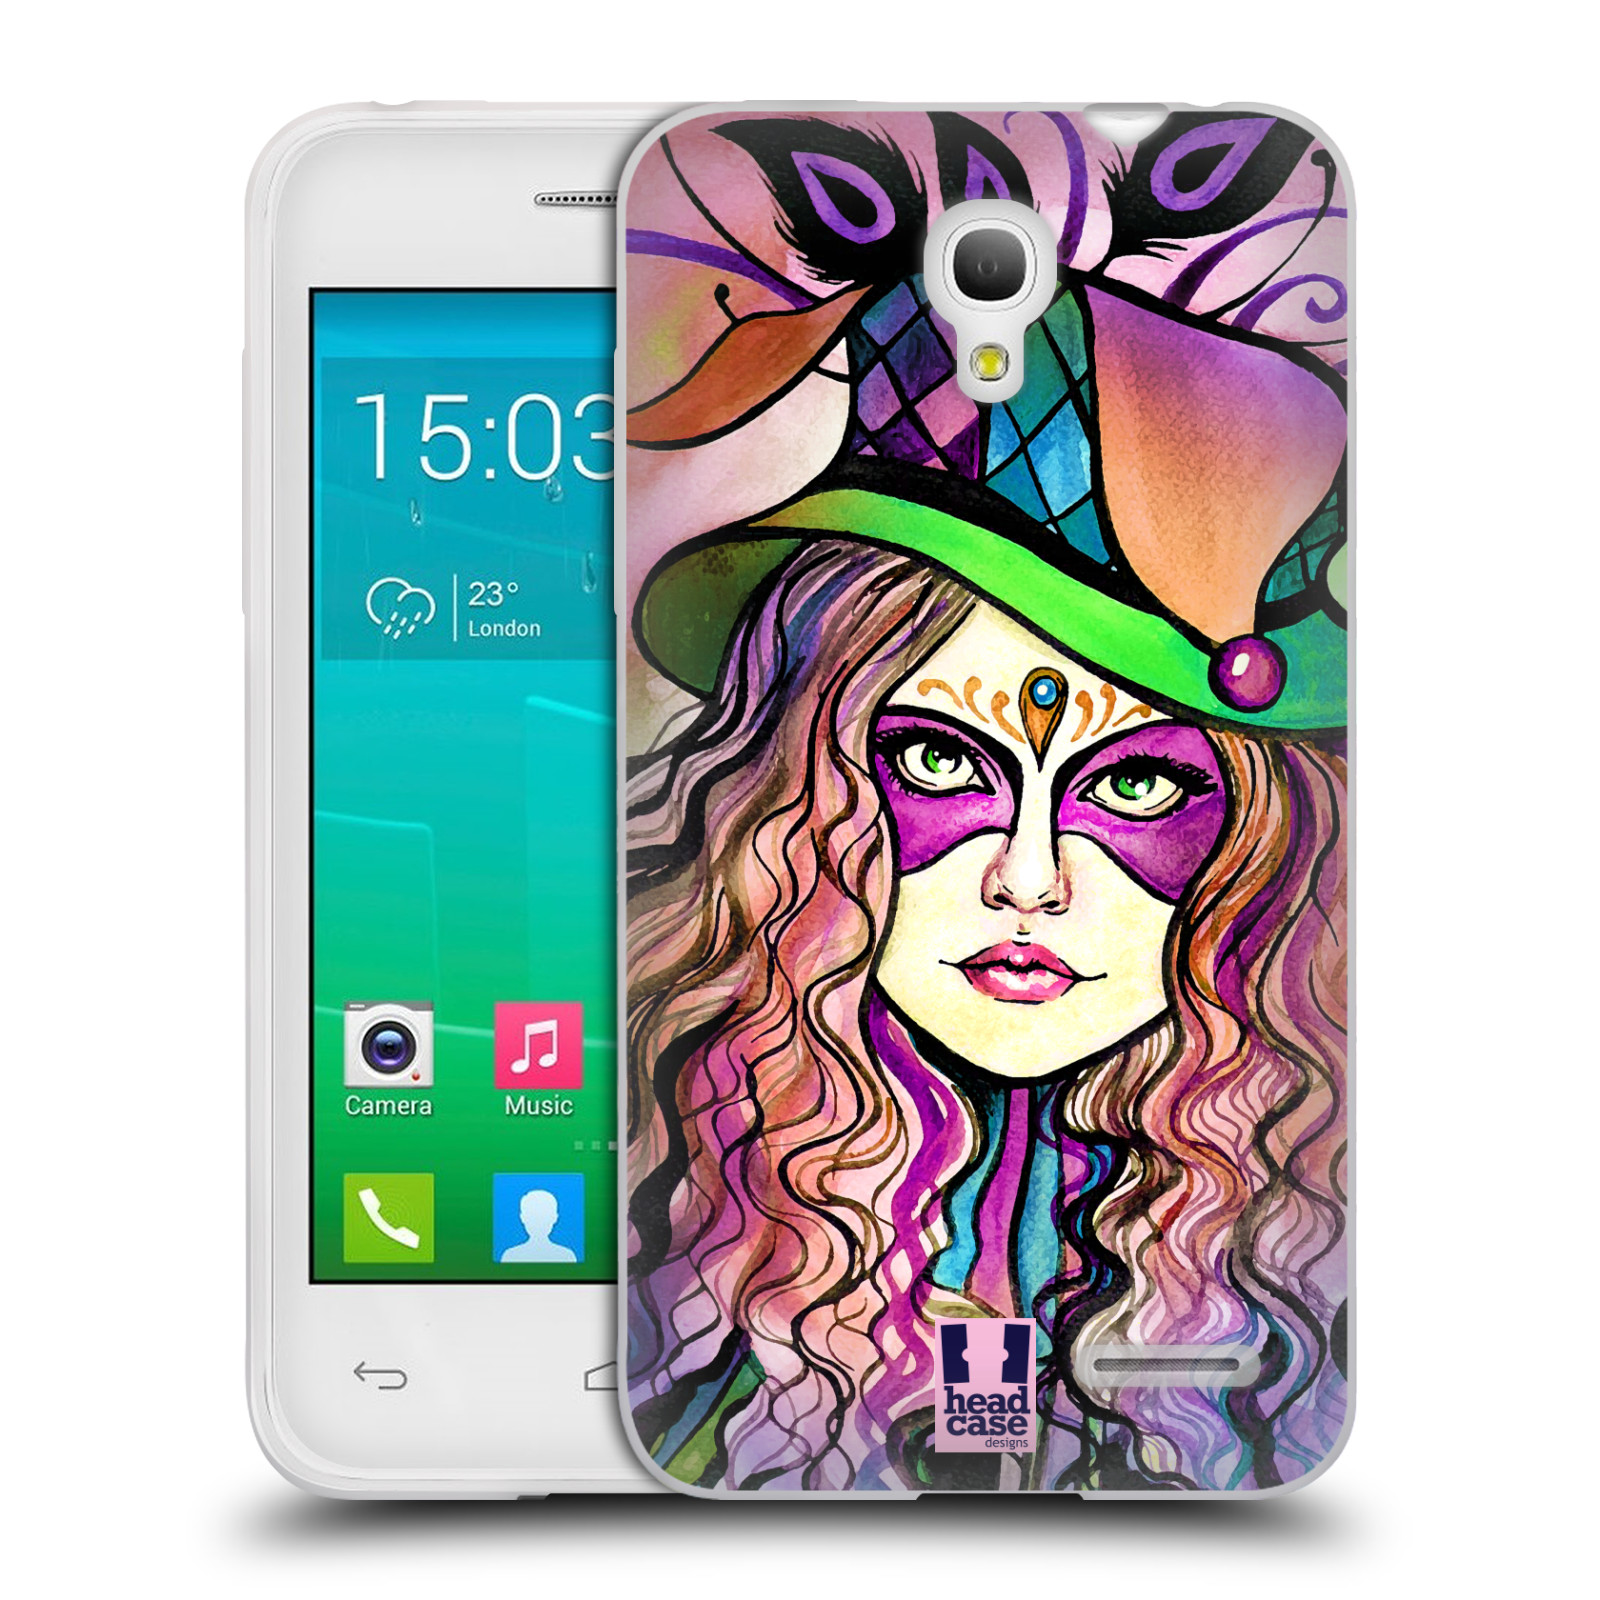 HEAD CASE silikonový obal na mobil Alcatel POP S3 OT-5050Y vzor Maškarní ples masky kreslené vzory KLOBOUK